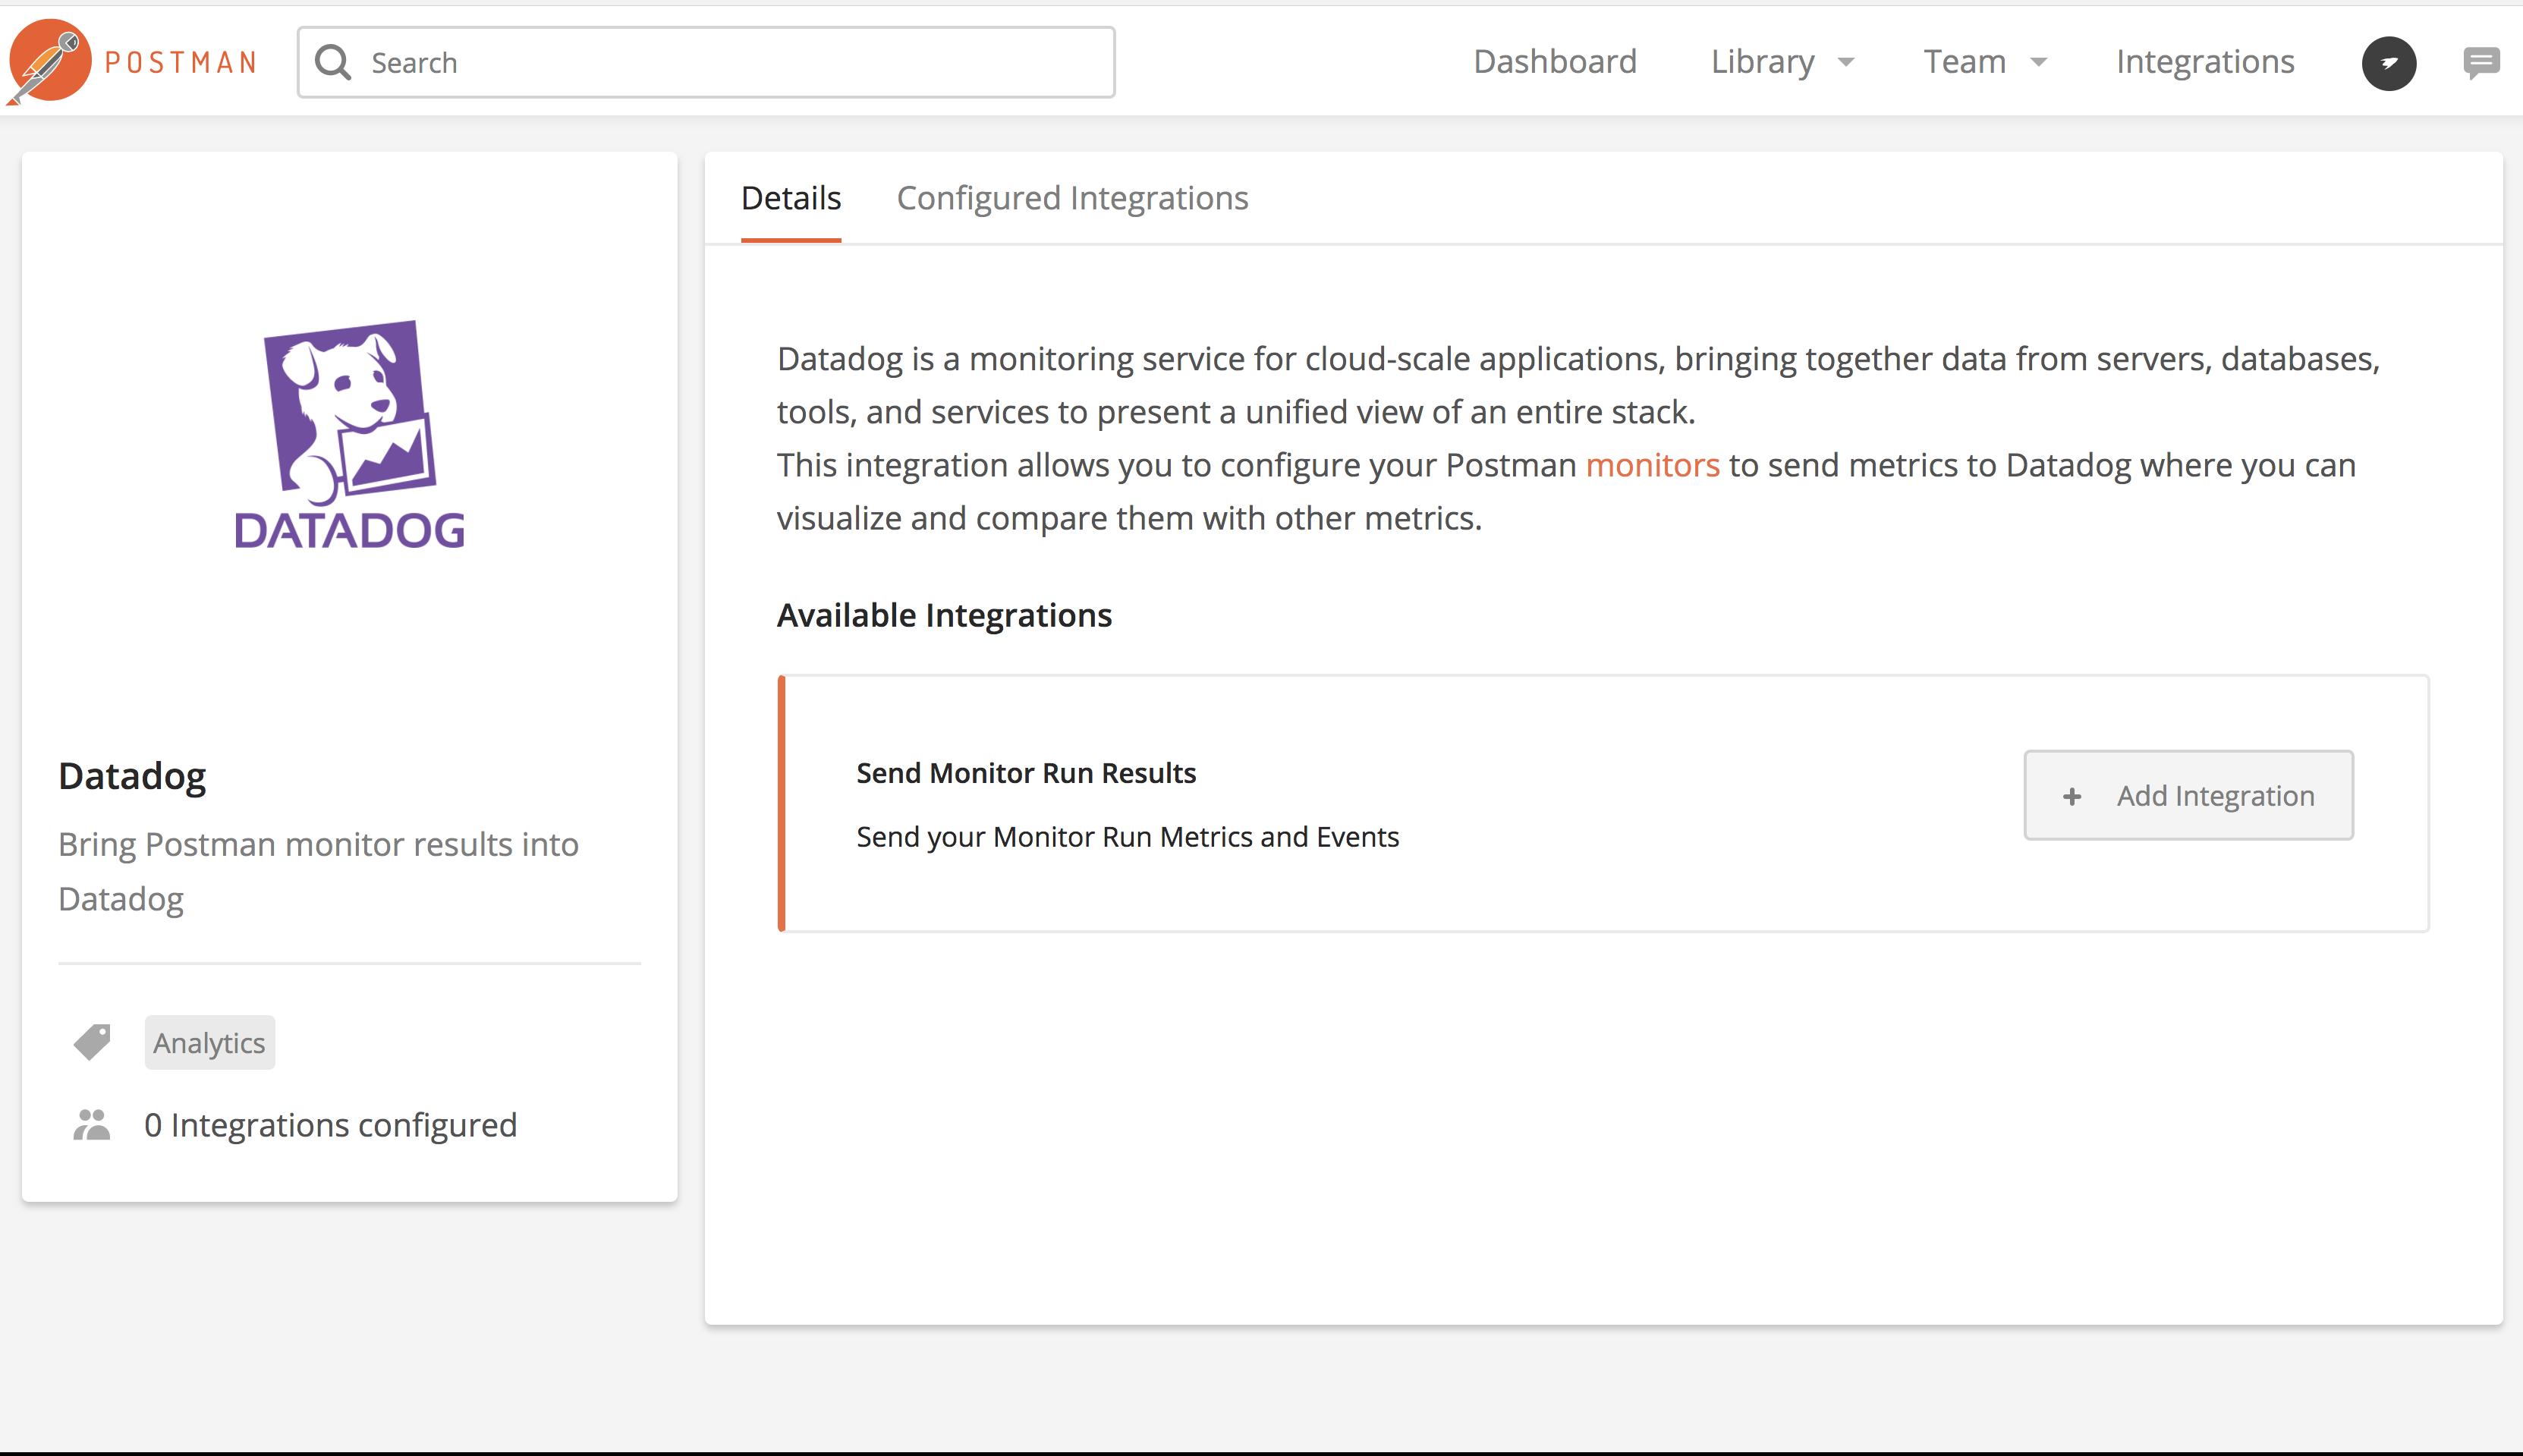 datadog integrations page